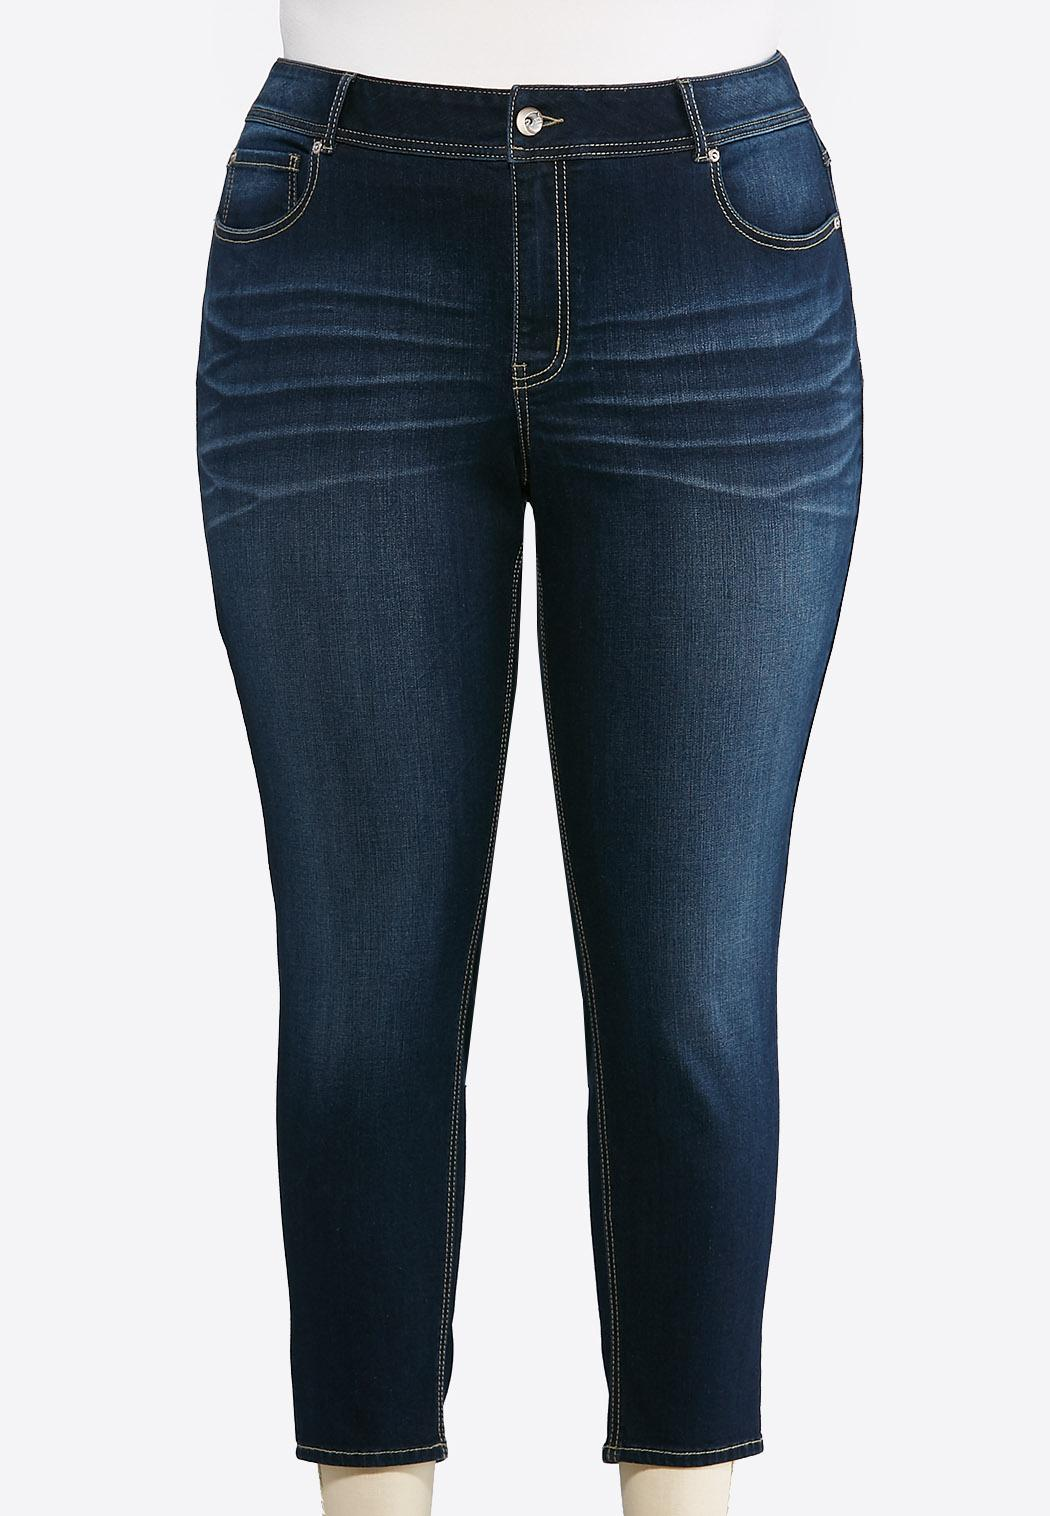 Plus Extended Dark Skinny Ankle Jeans